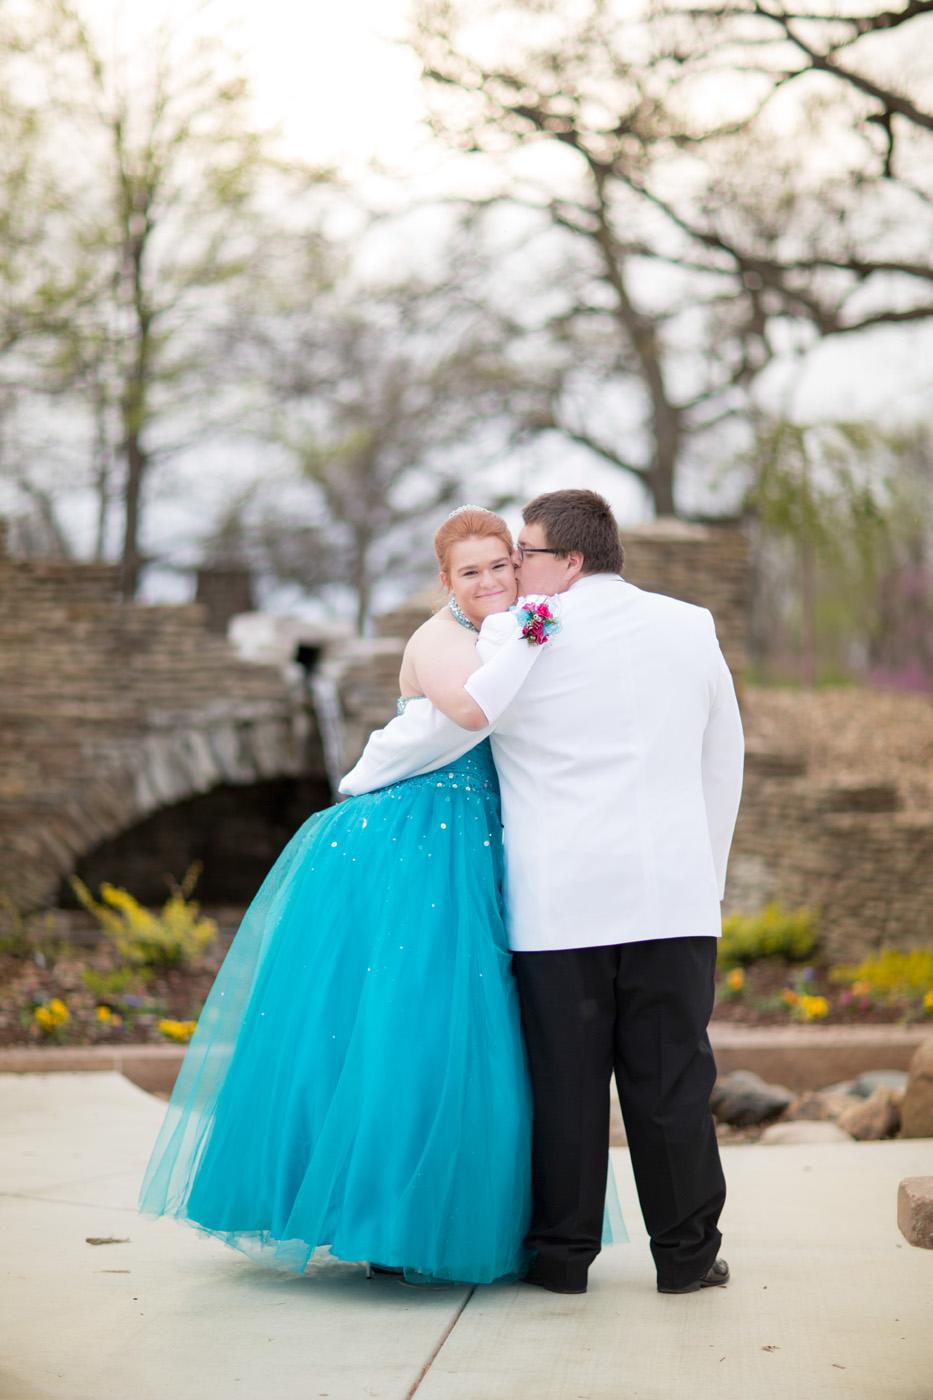 Garrett & Helen Prom 2014 246.jpg